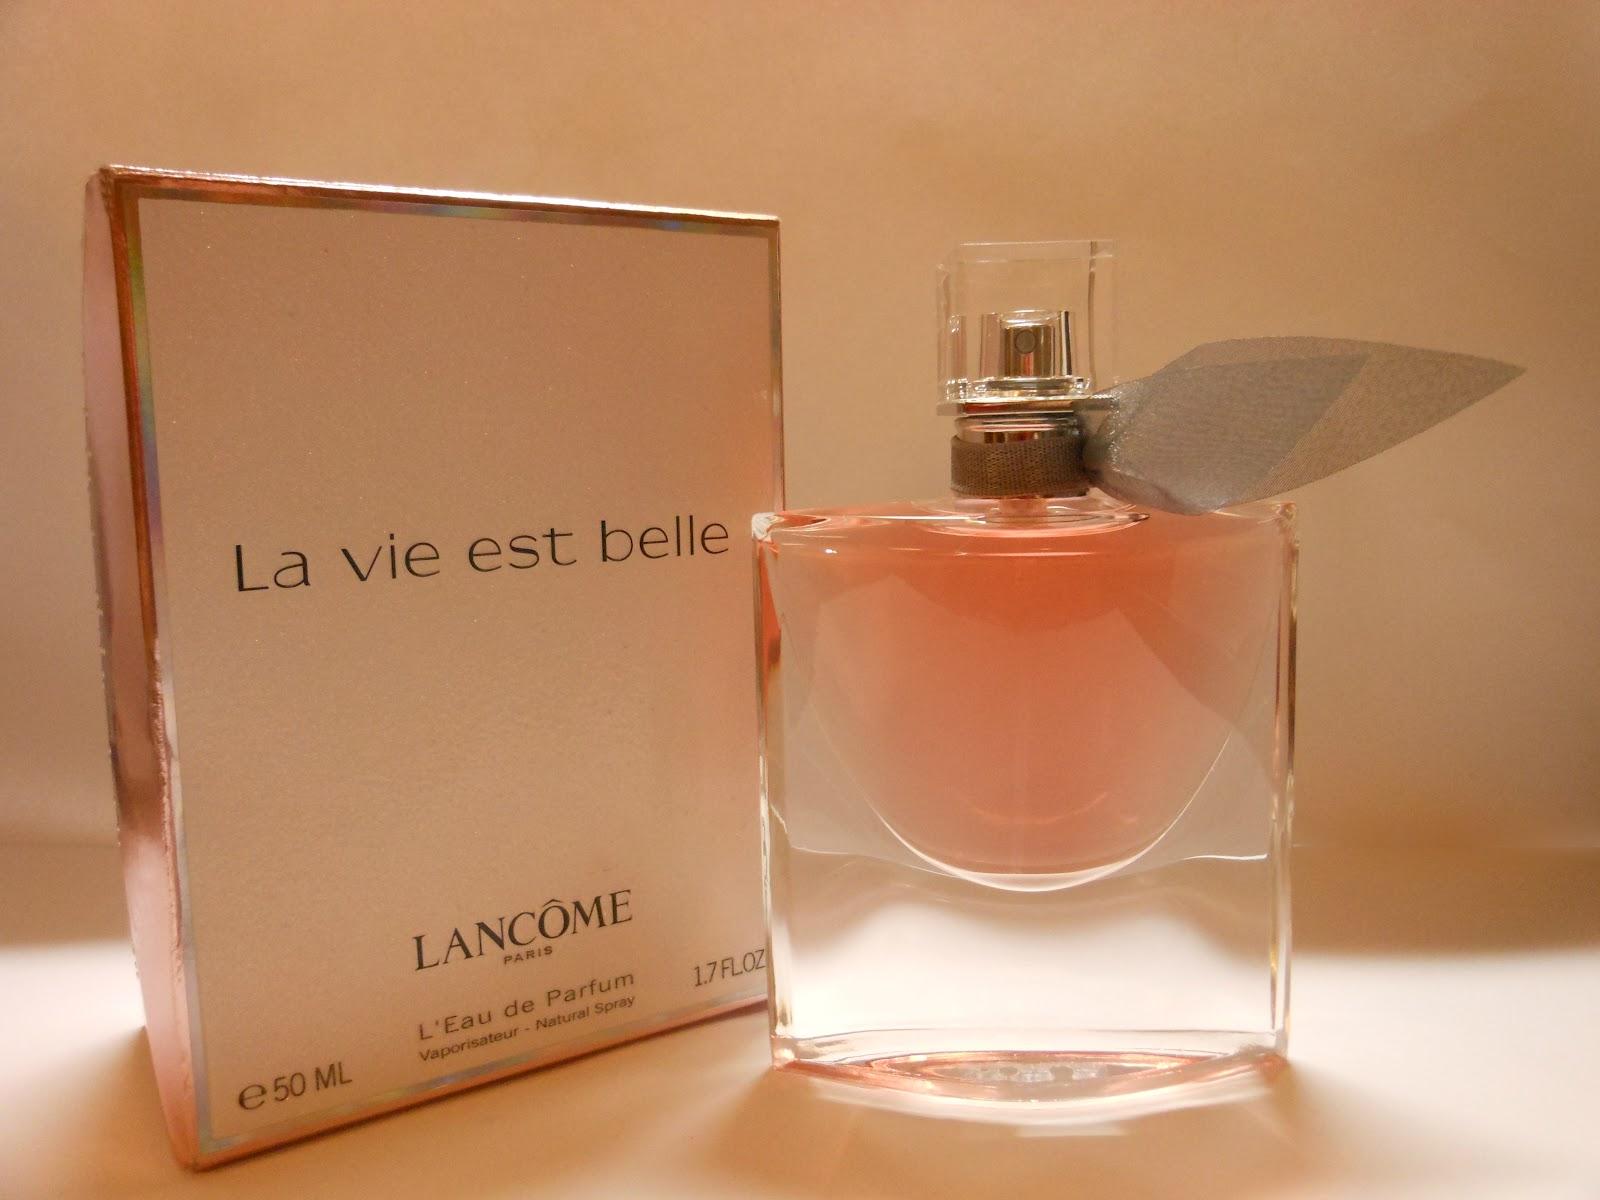 cherrysue doin 39 the do introducing lanc me 39 s newest fragrance la vie est belle. Black Bedroom Furniture Sets. Home Design Ideas